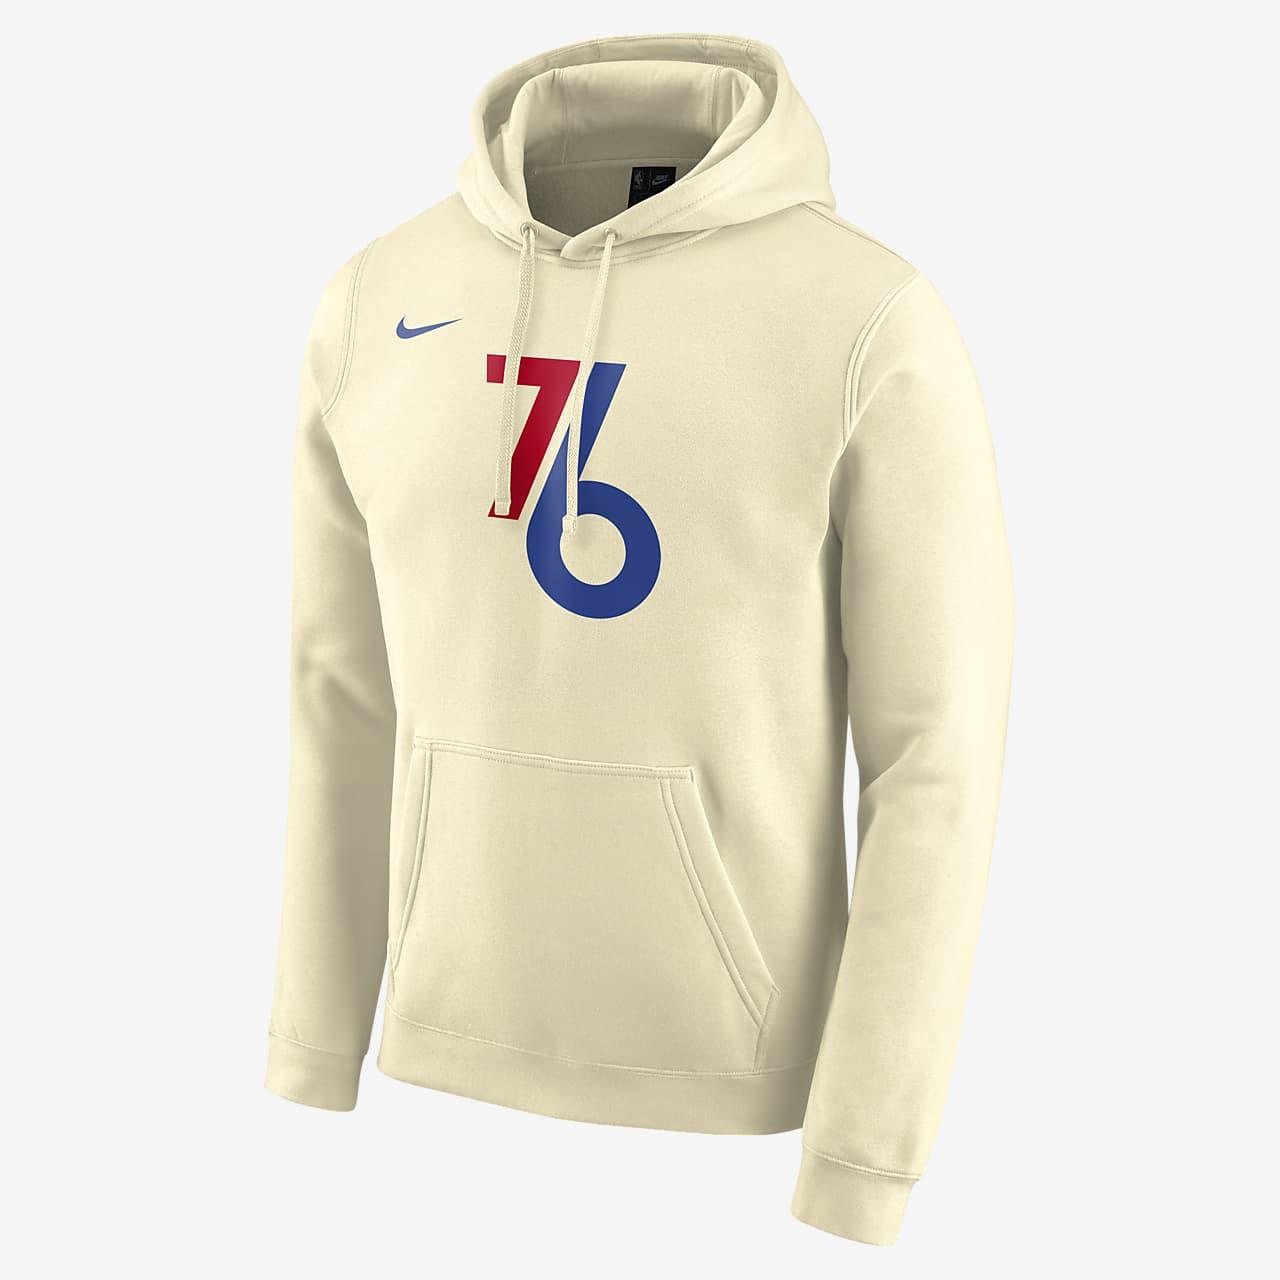 费城 76 人队 City Edition Logo Nike NBA 男子连帽衫